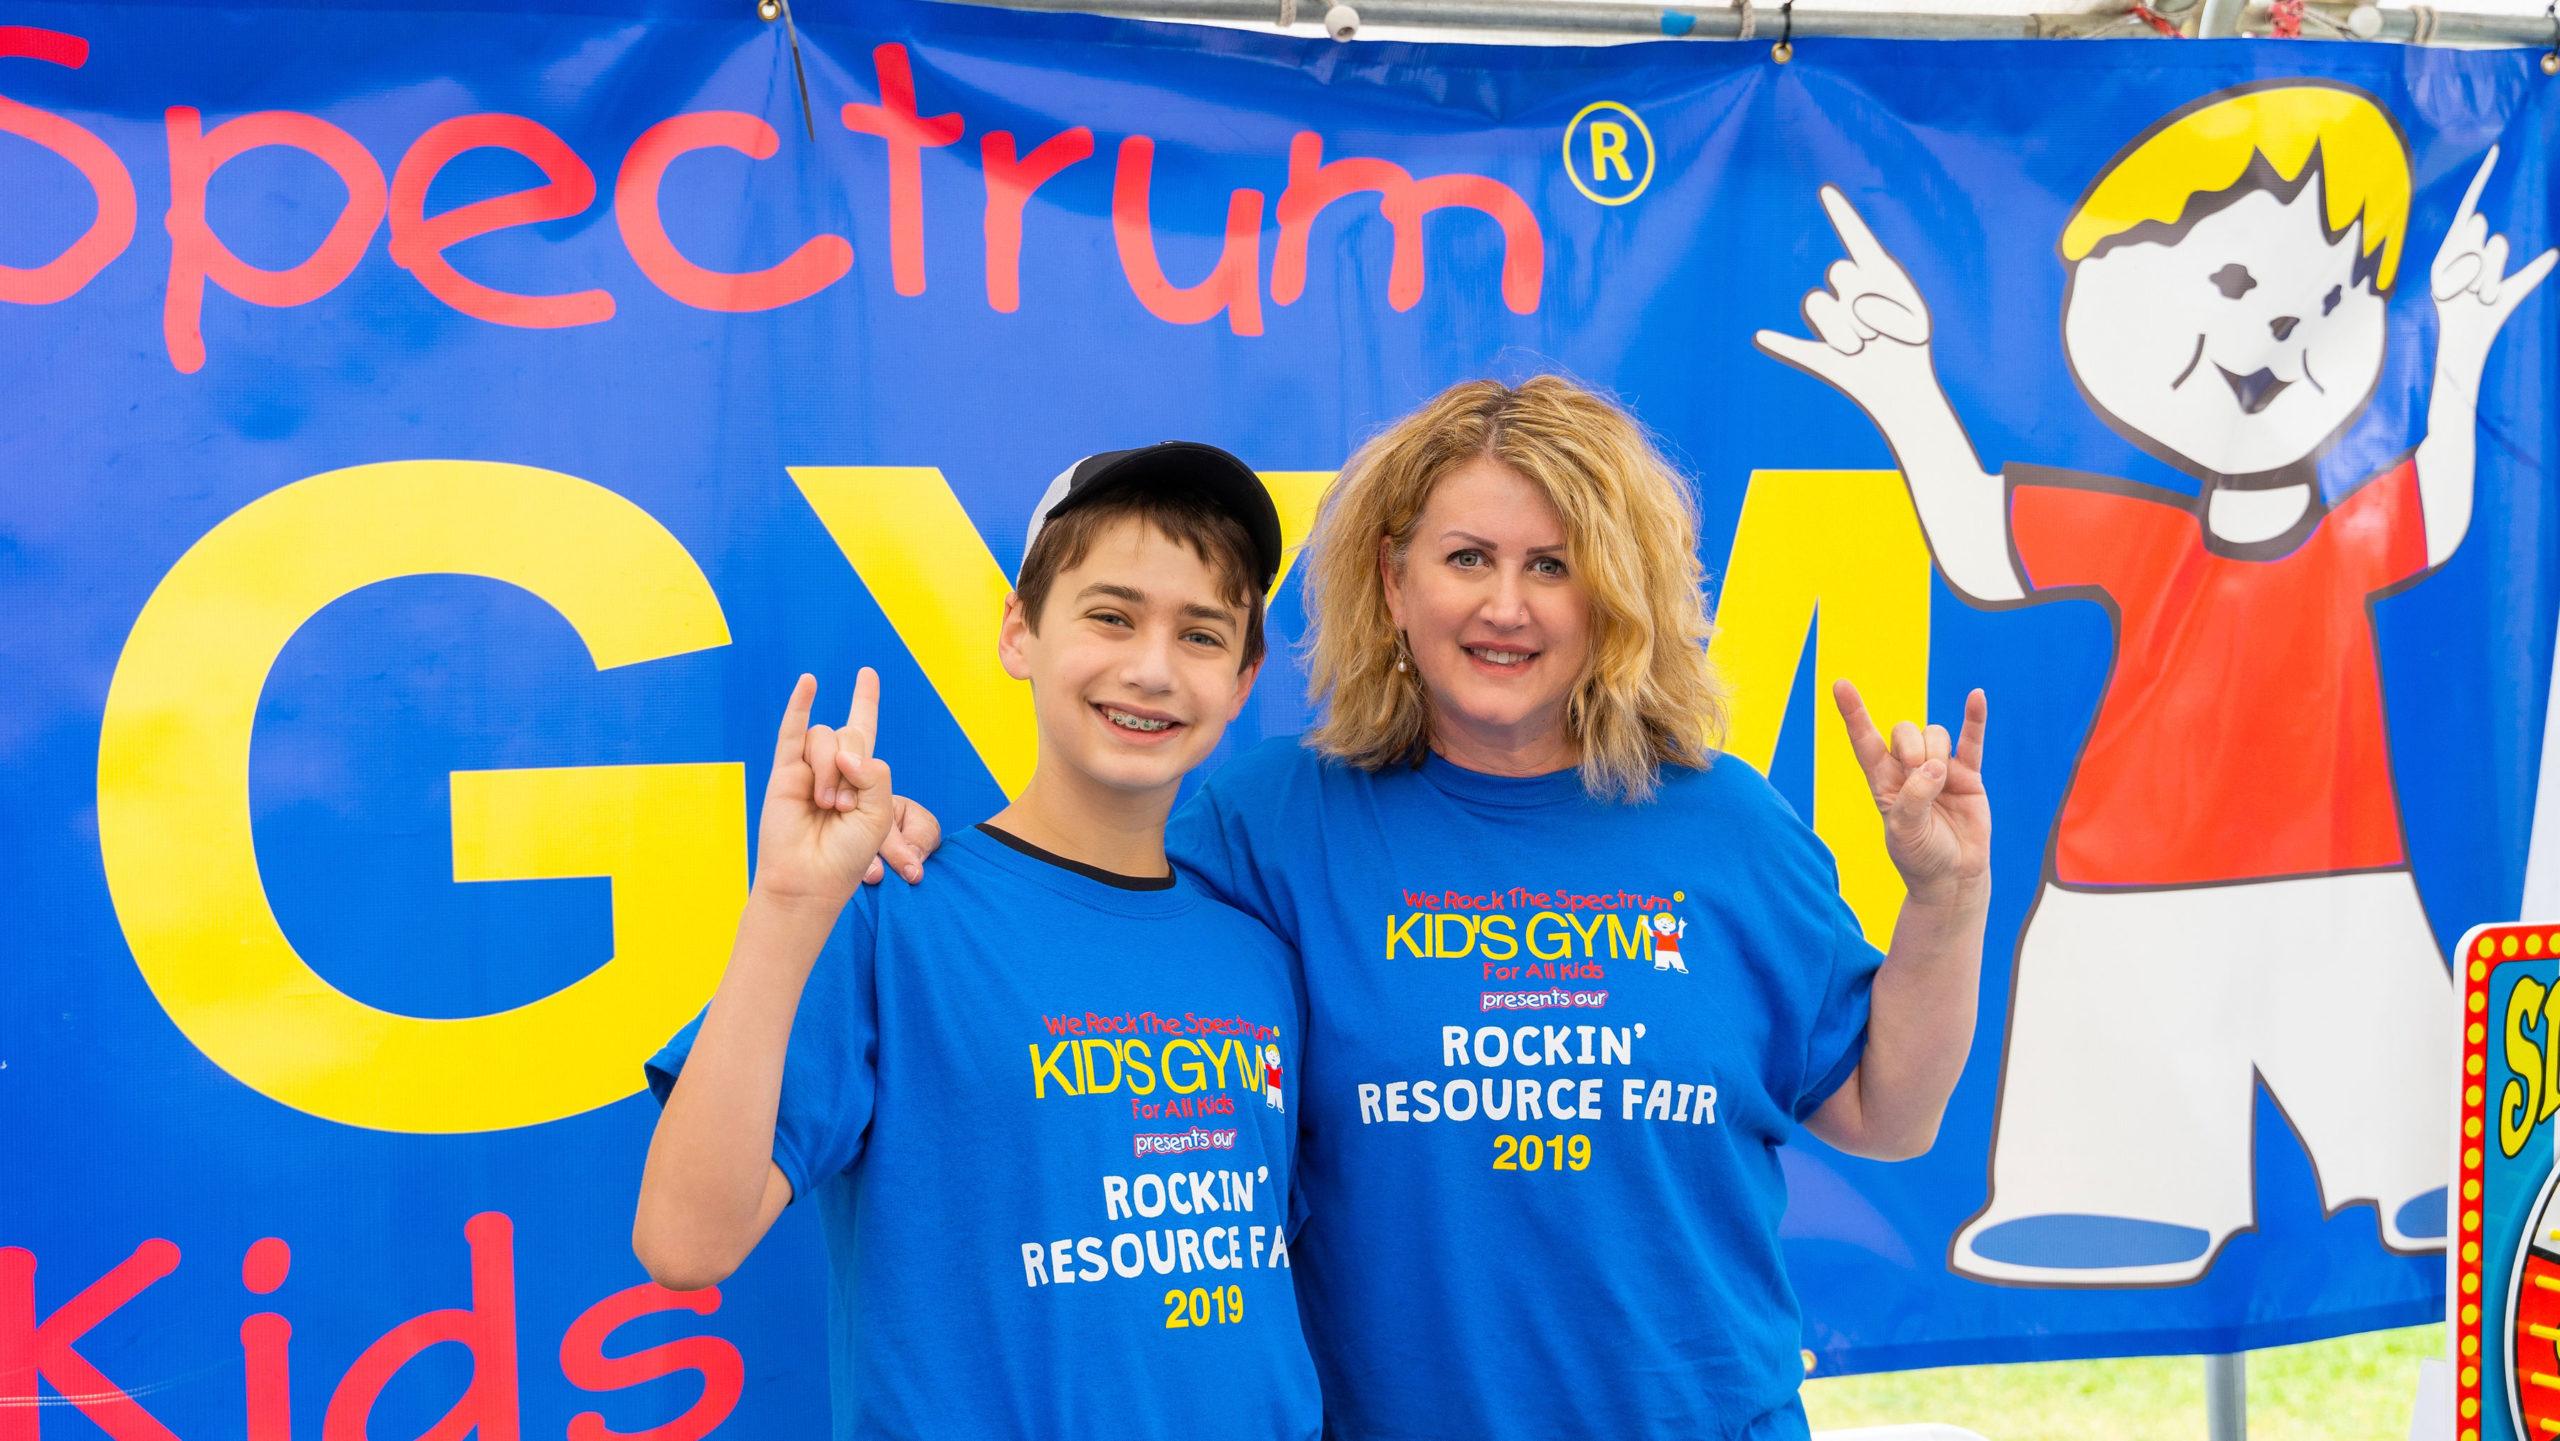 Rockin Resource Fair 2019